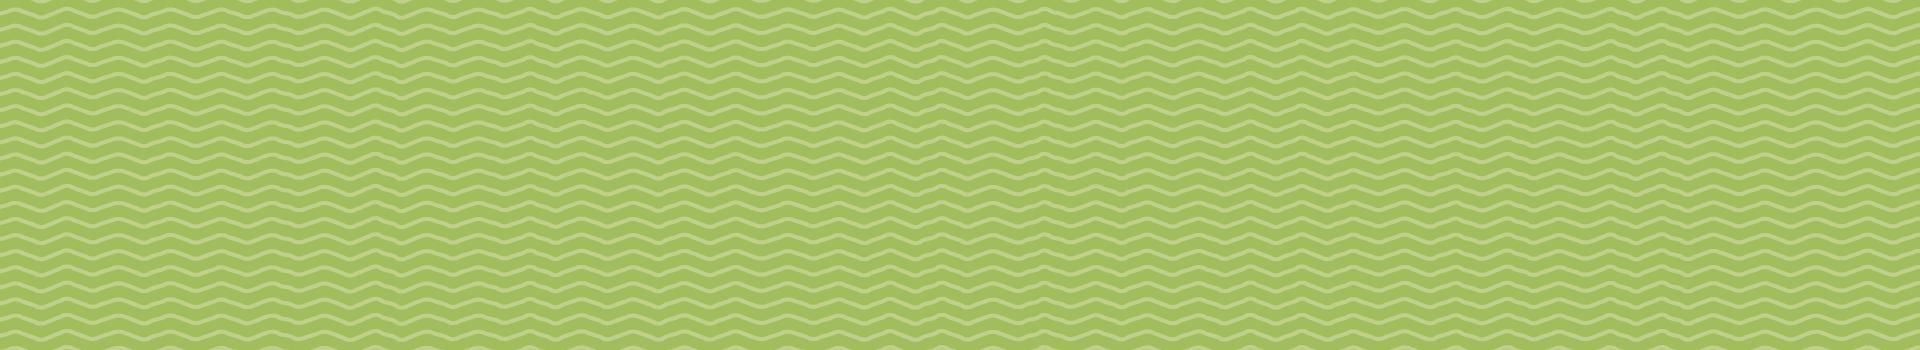 green-zig-zag